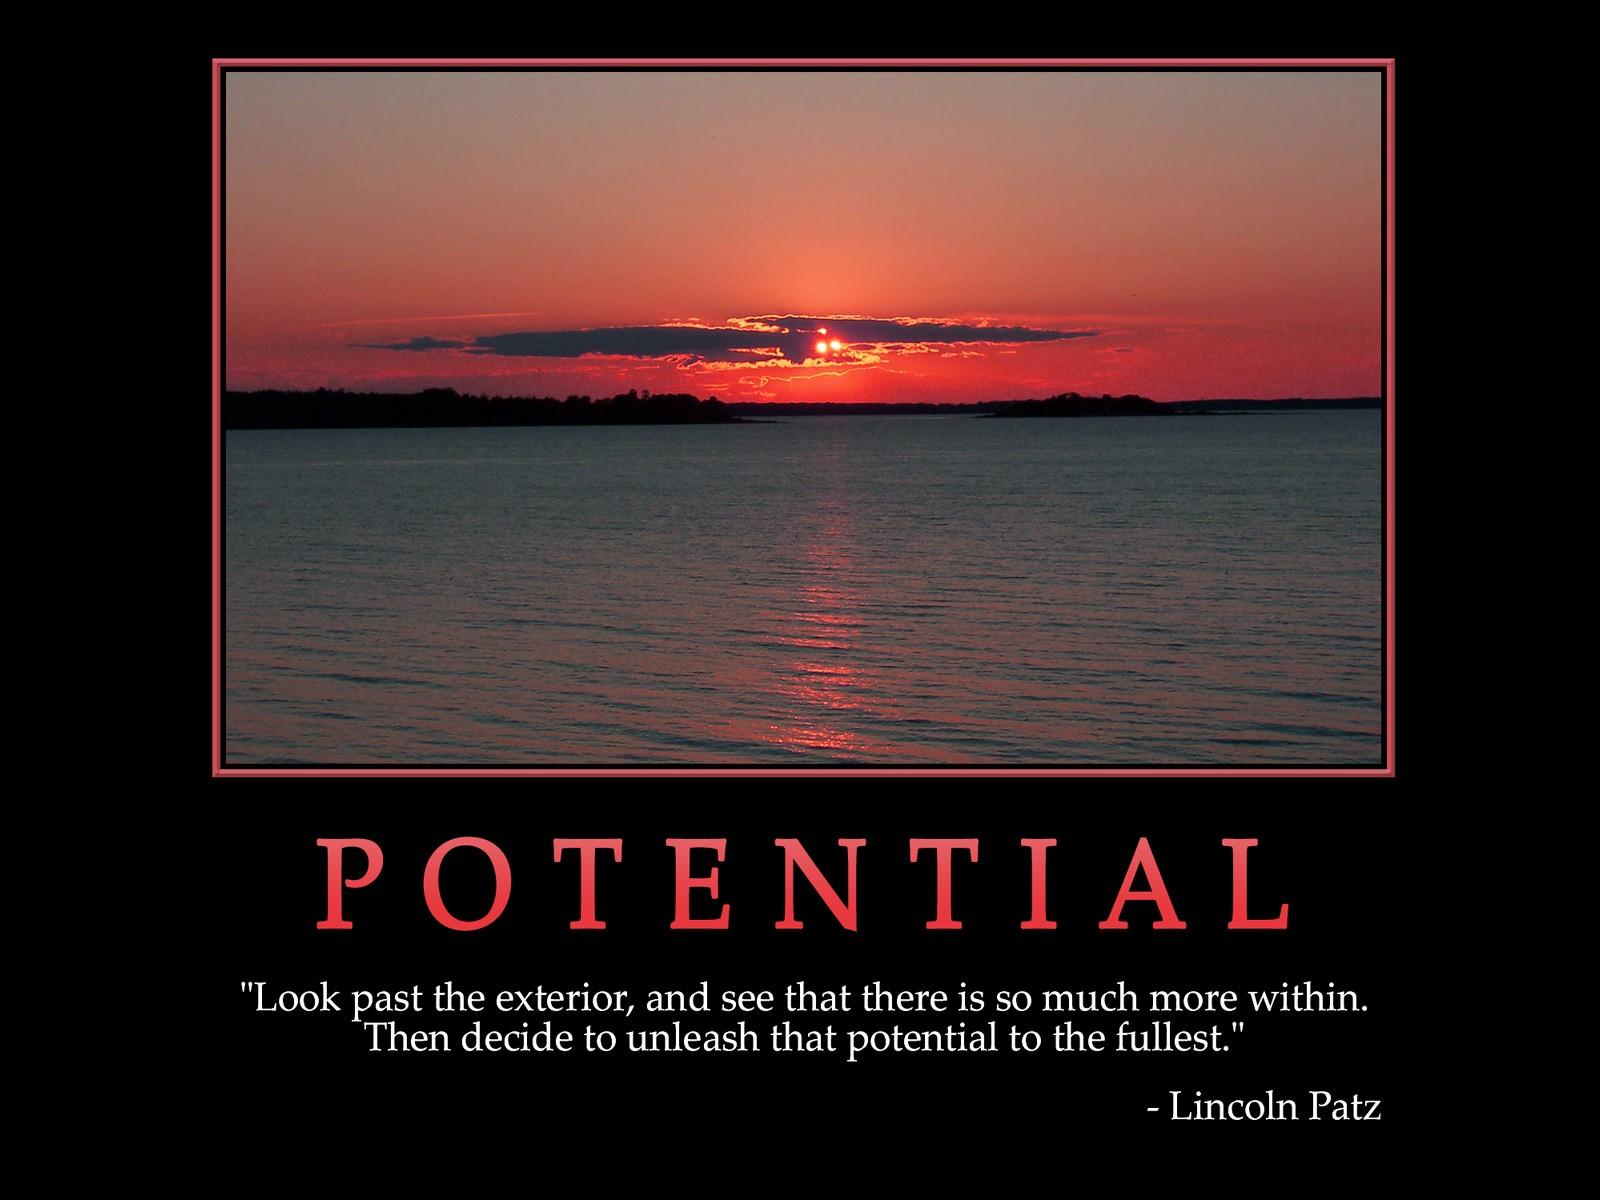 Google Motivational Posters  Dan Johnson\u002639;s Blog